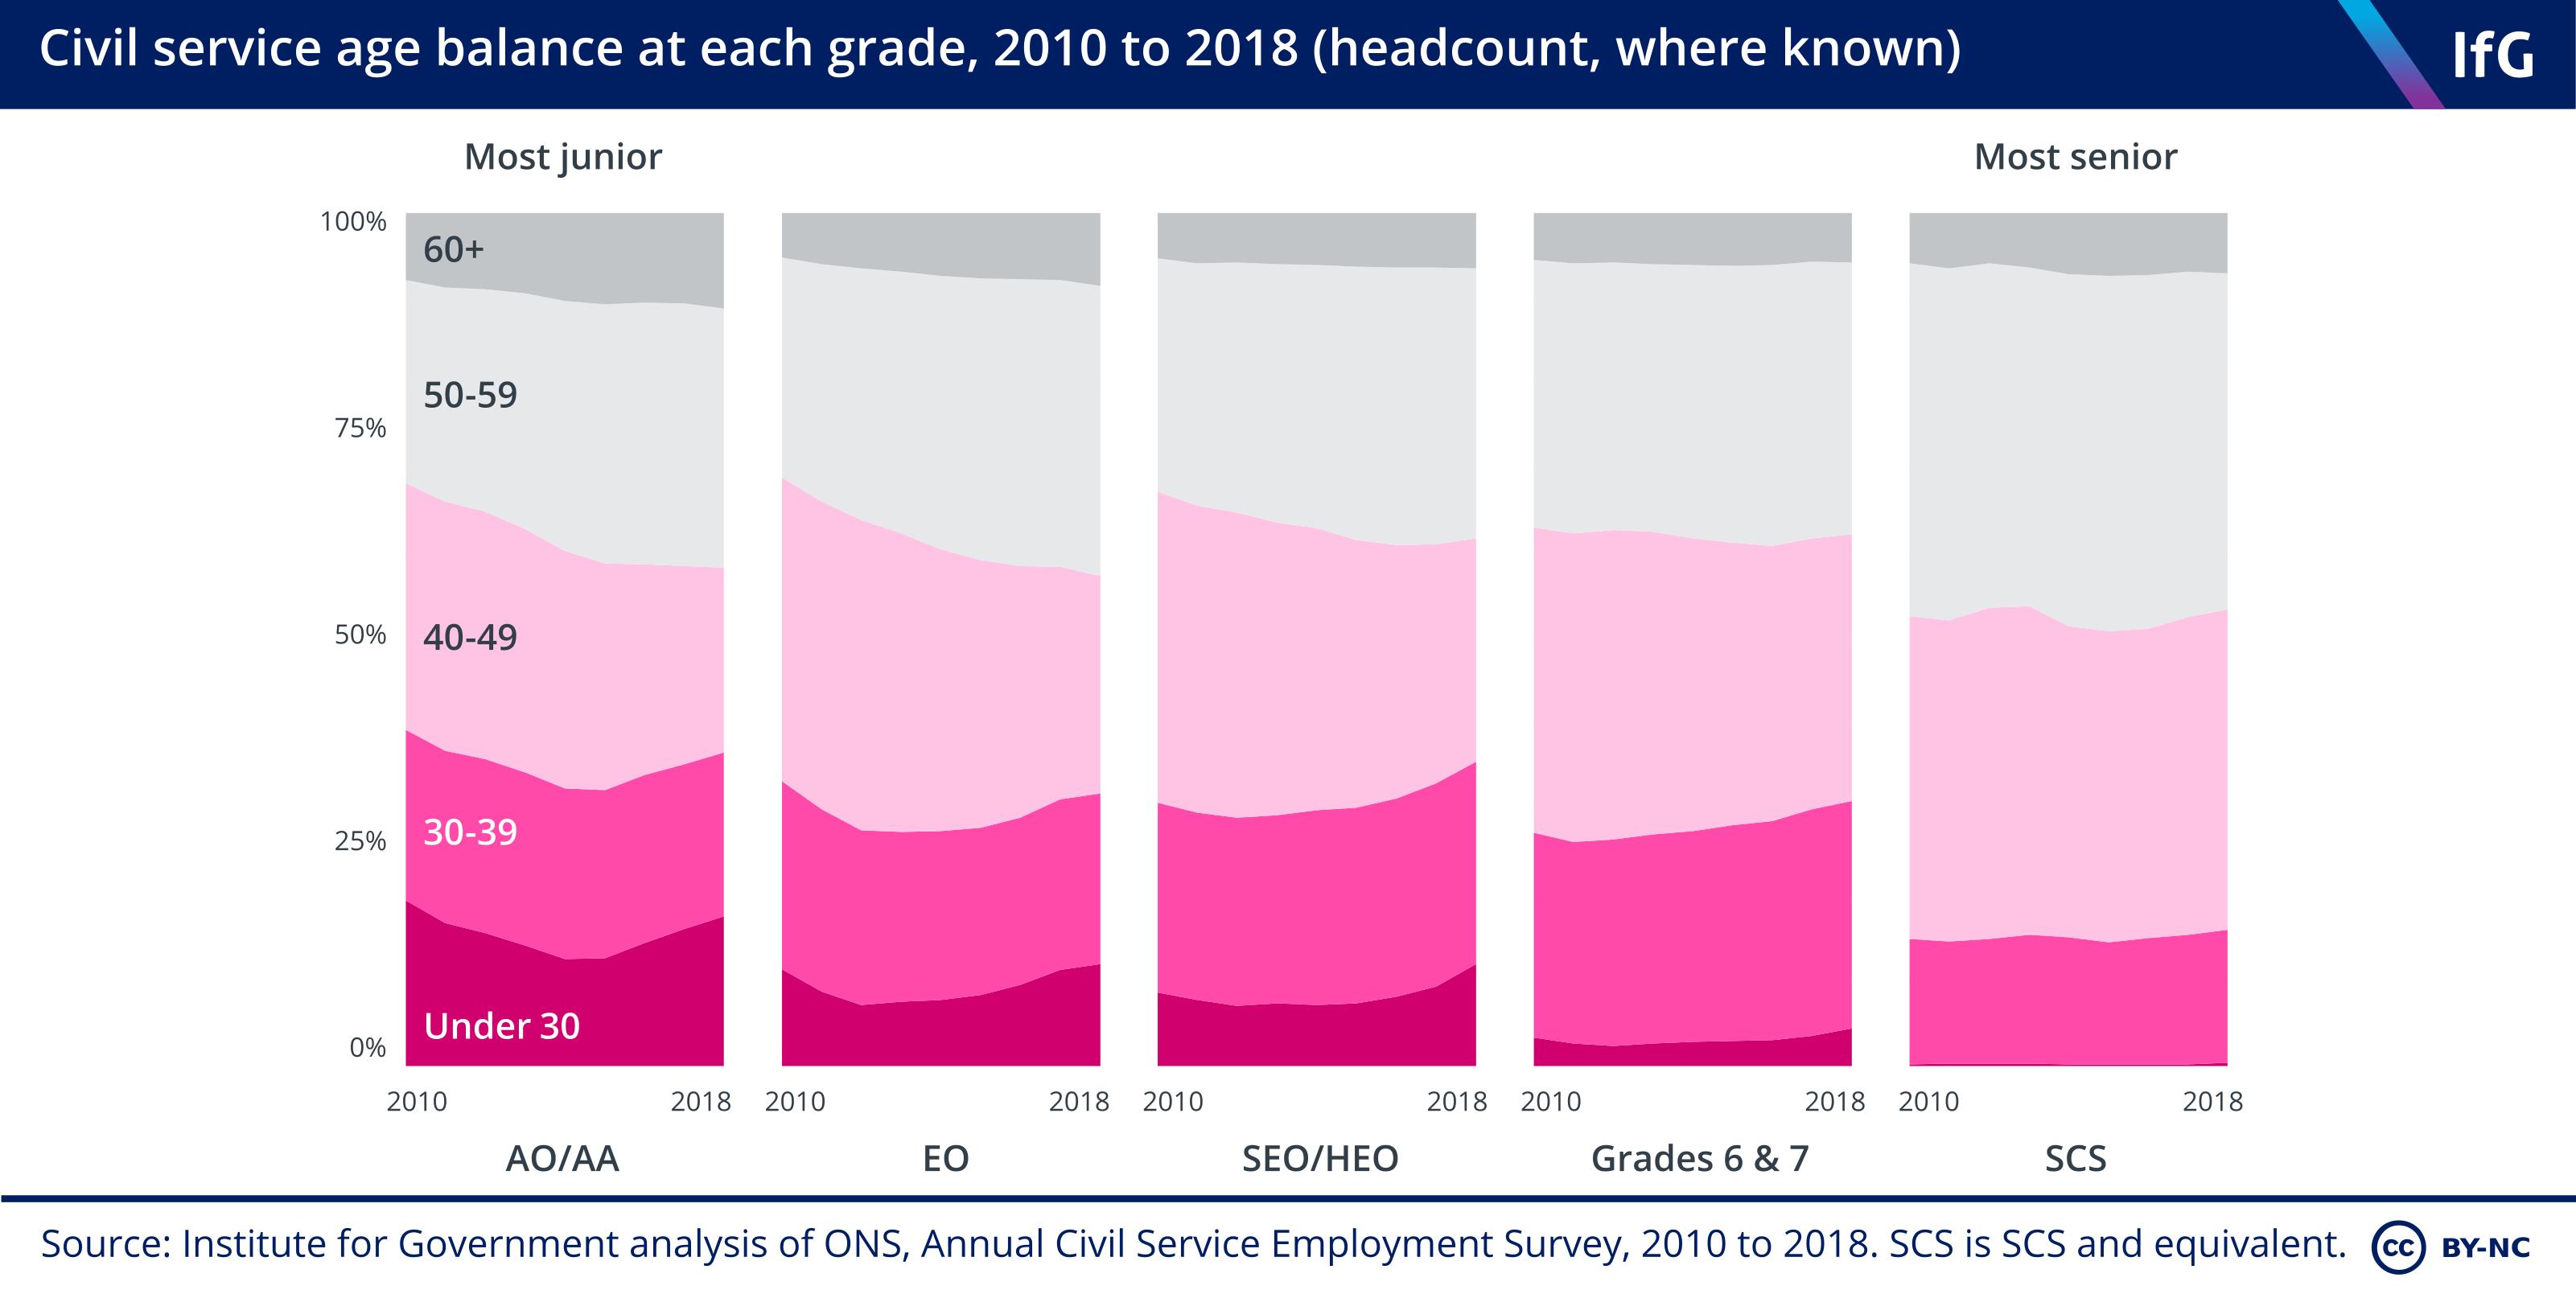 Civil service age balance at each grade